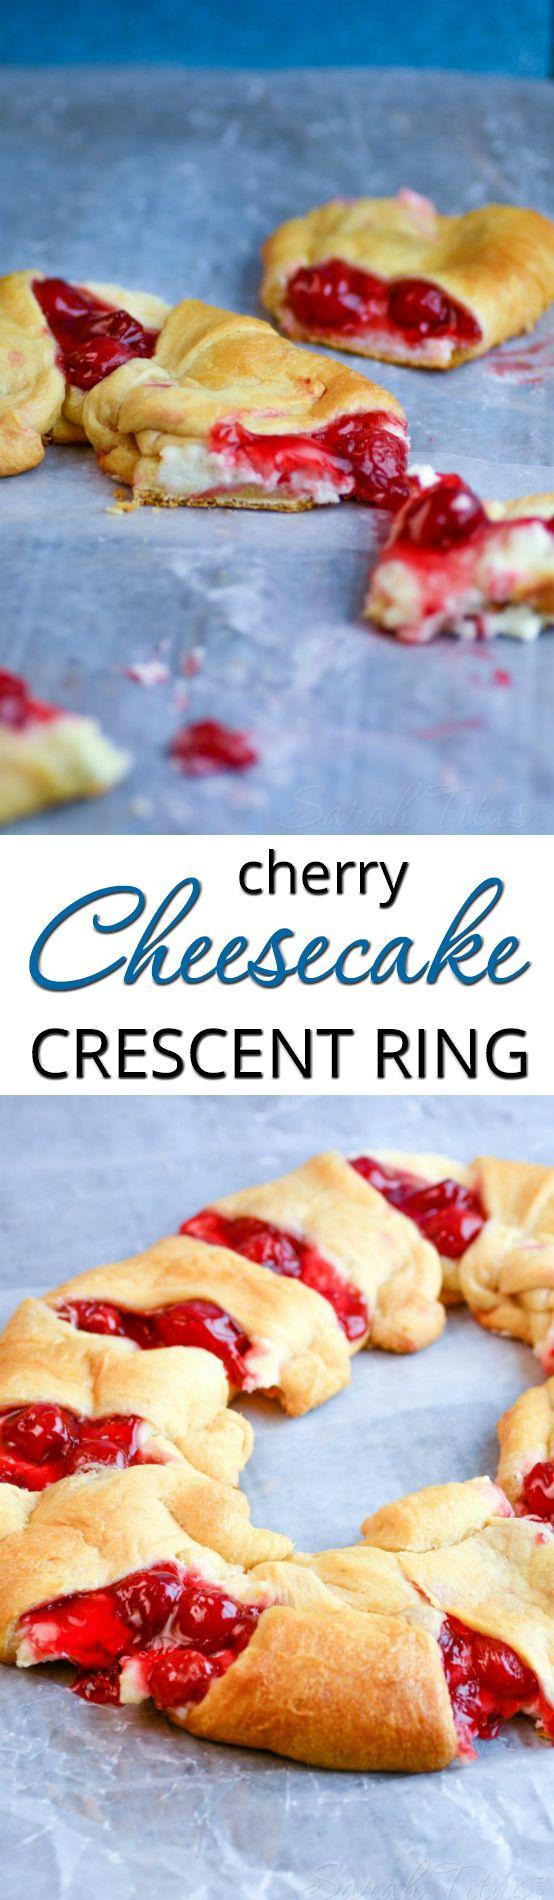 Cherry and Cheesecake Crescent Ring